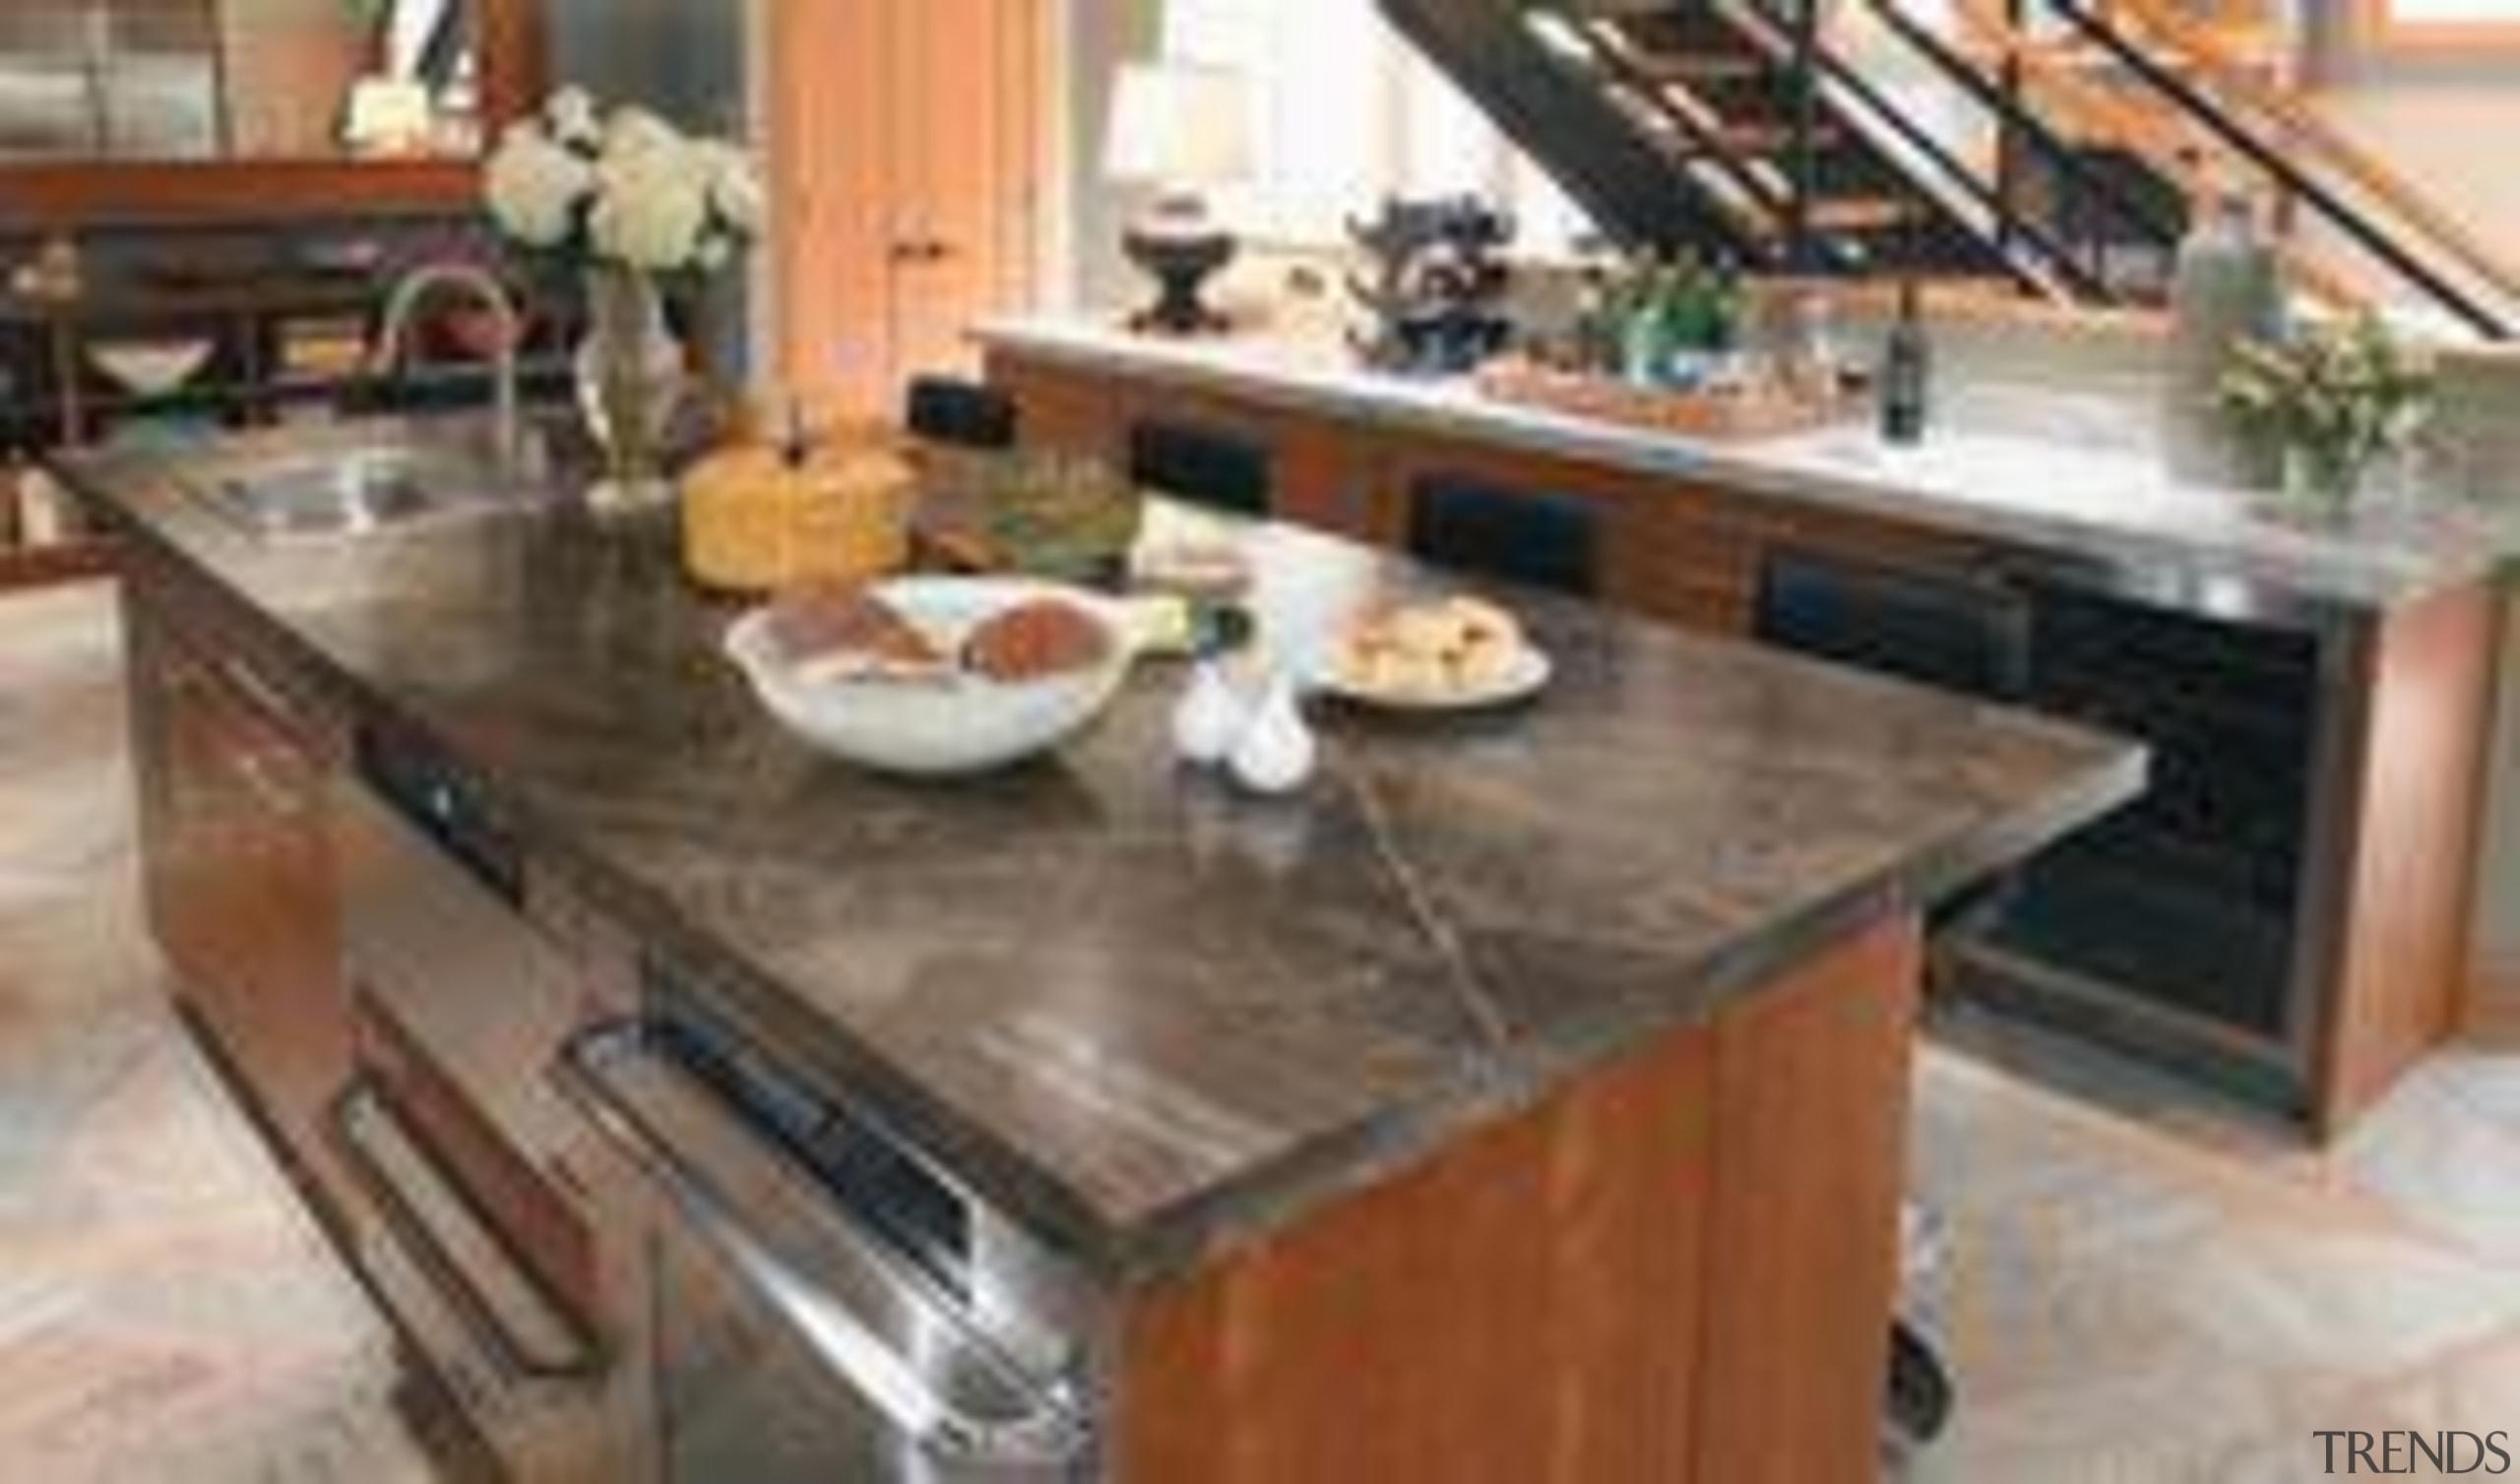 My Dream Kitchen : Inspiration Gallery : Classic countertop, floor, flooring, furniture, granite, hardwood, kitchen, table, wood flooring, wood stain, brown, gray